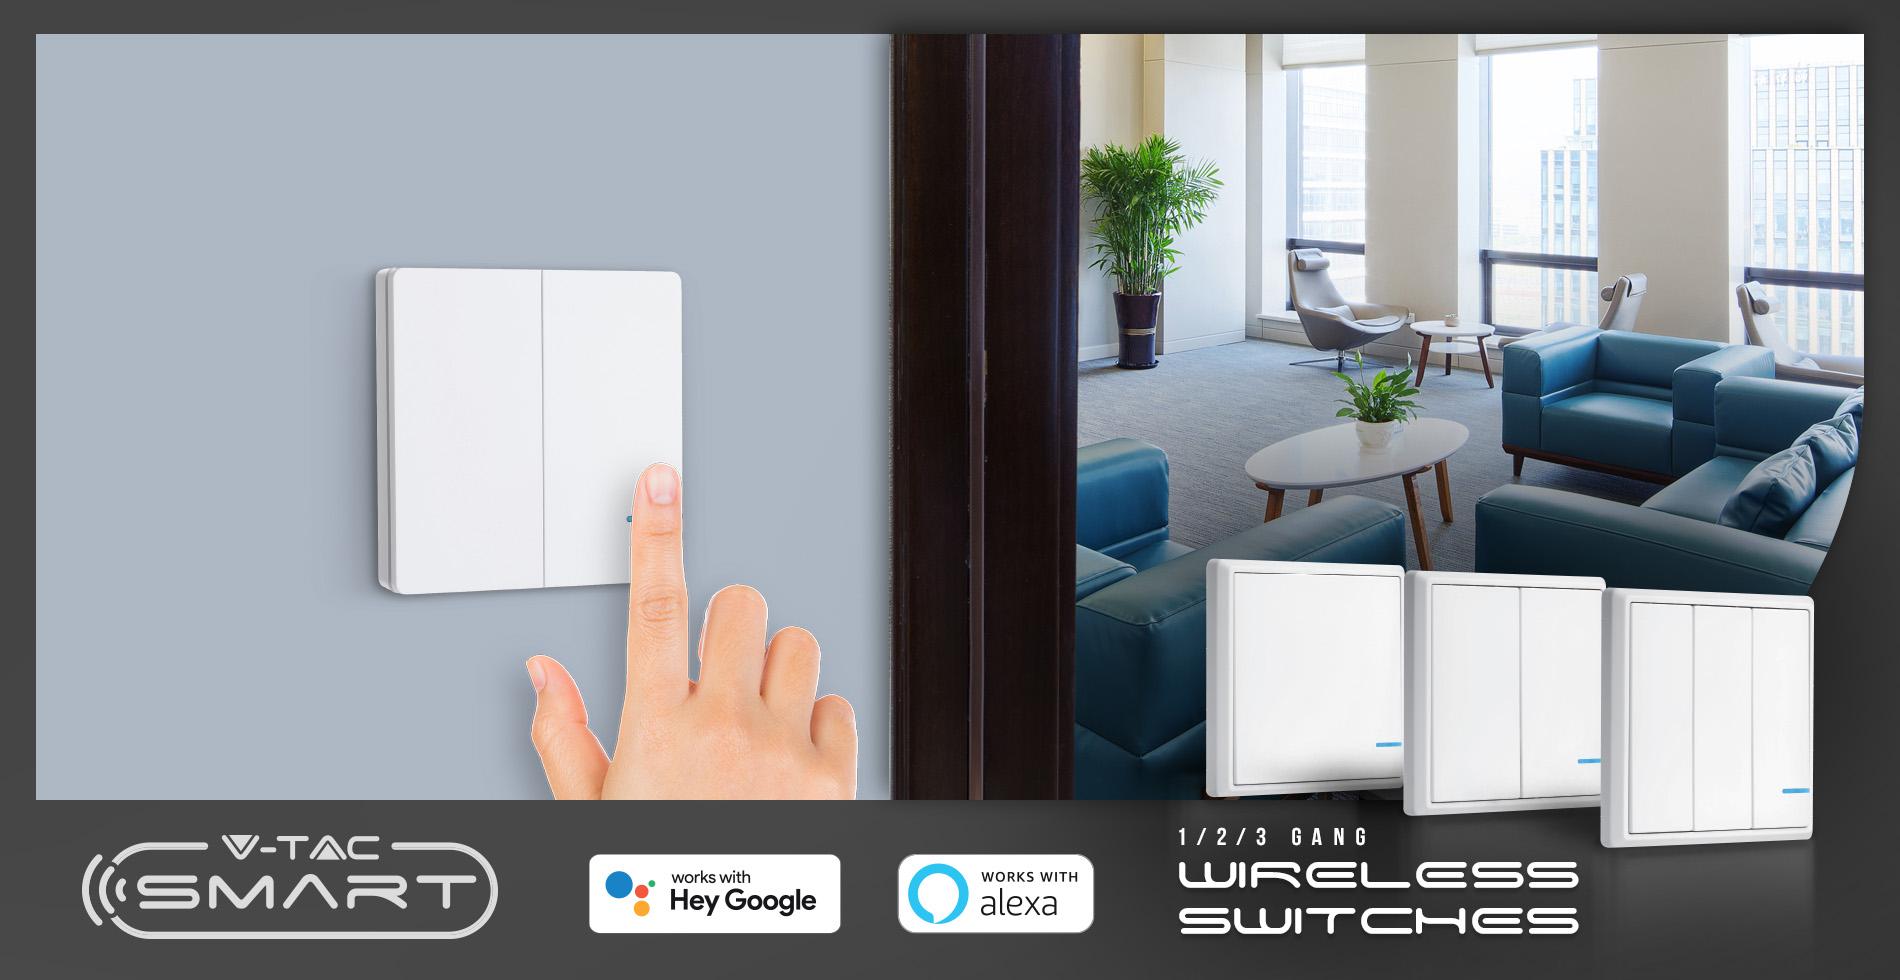 Wireless Switches